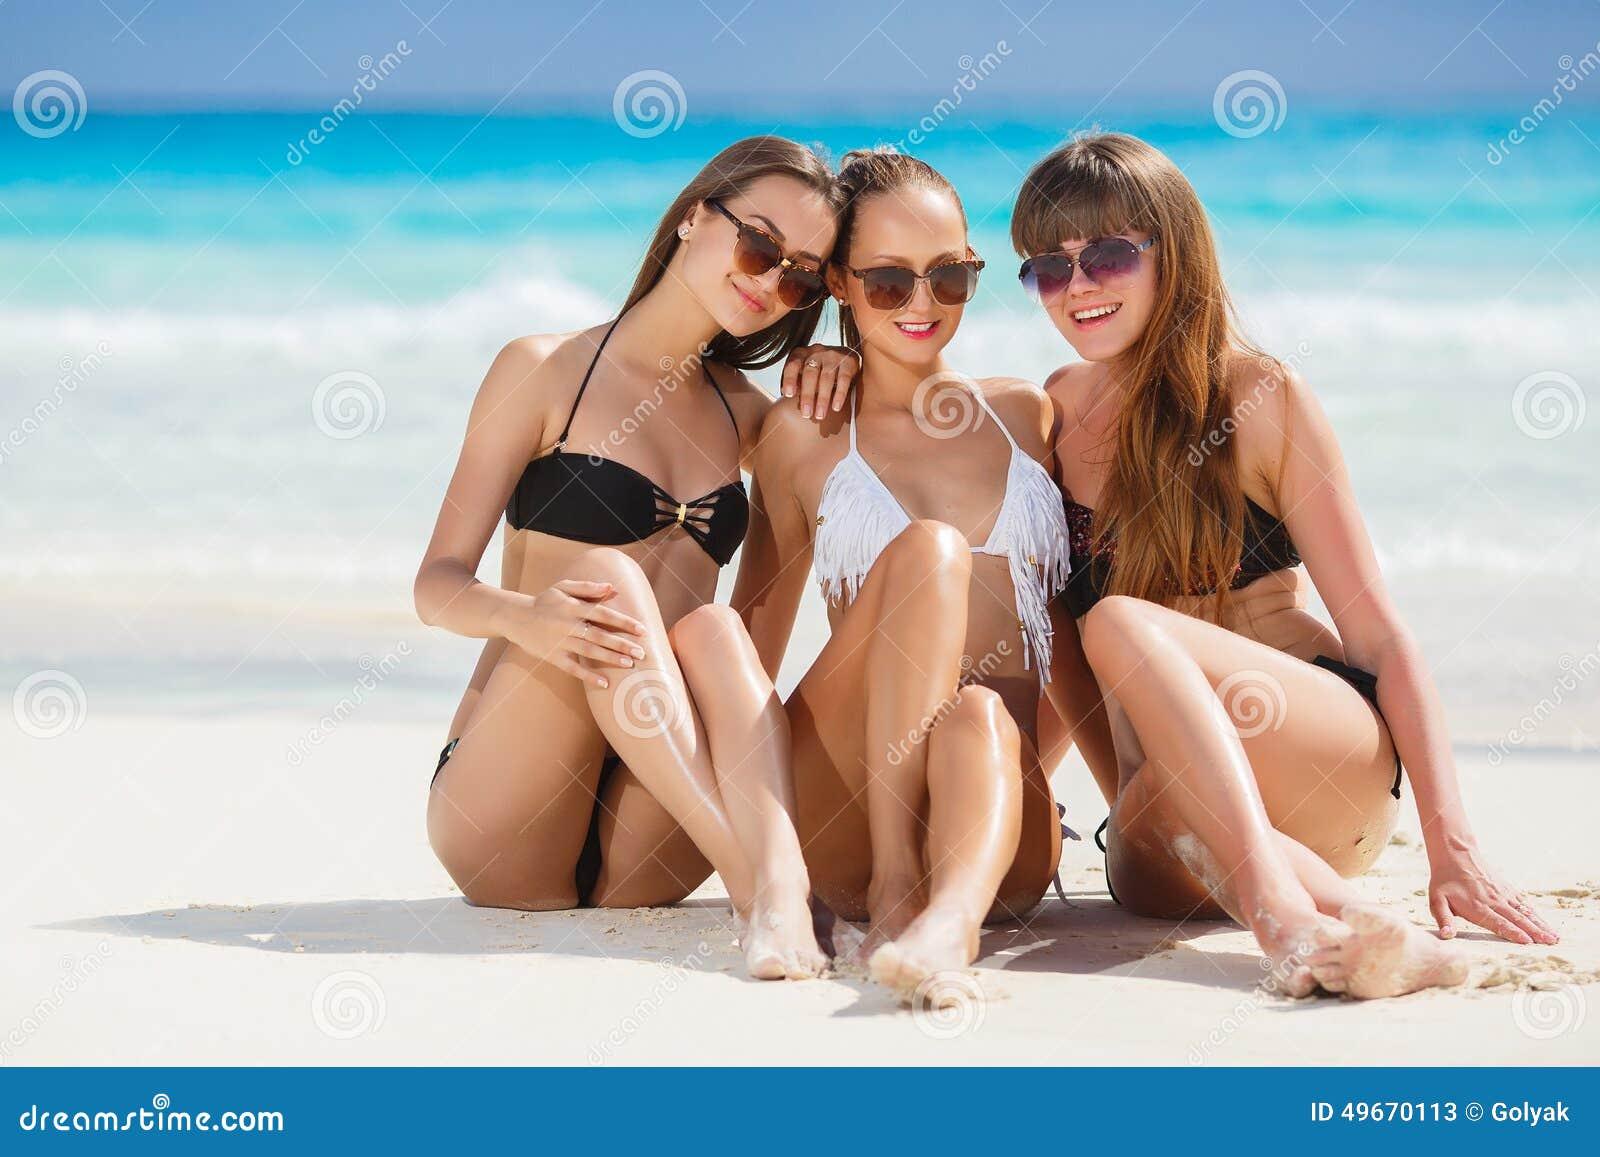 girls in bikinis sunbathing  sitting on the beach stock Beach Sun Clip Art Eating Clip Art